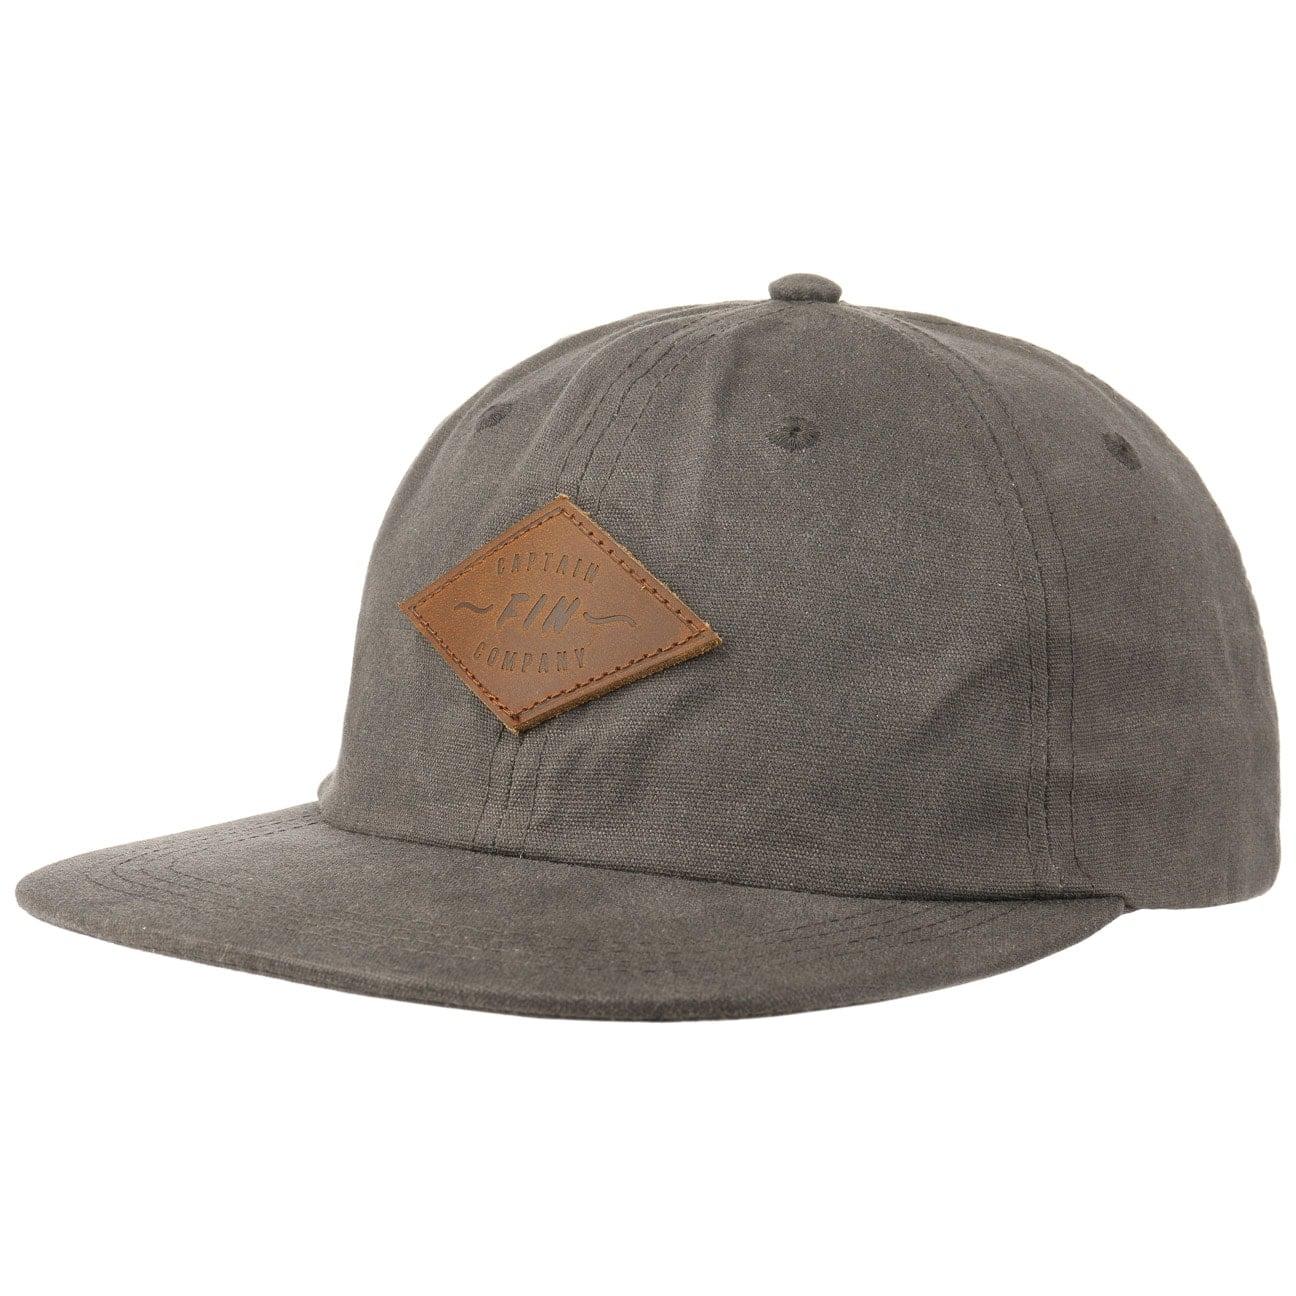 Casquette Skippy Snapback by Captain Fin  baseball cap